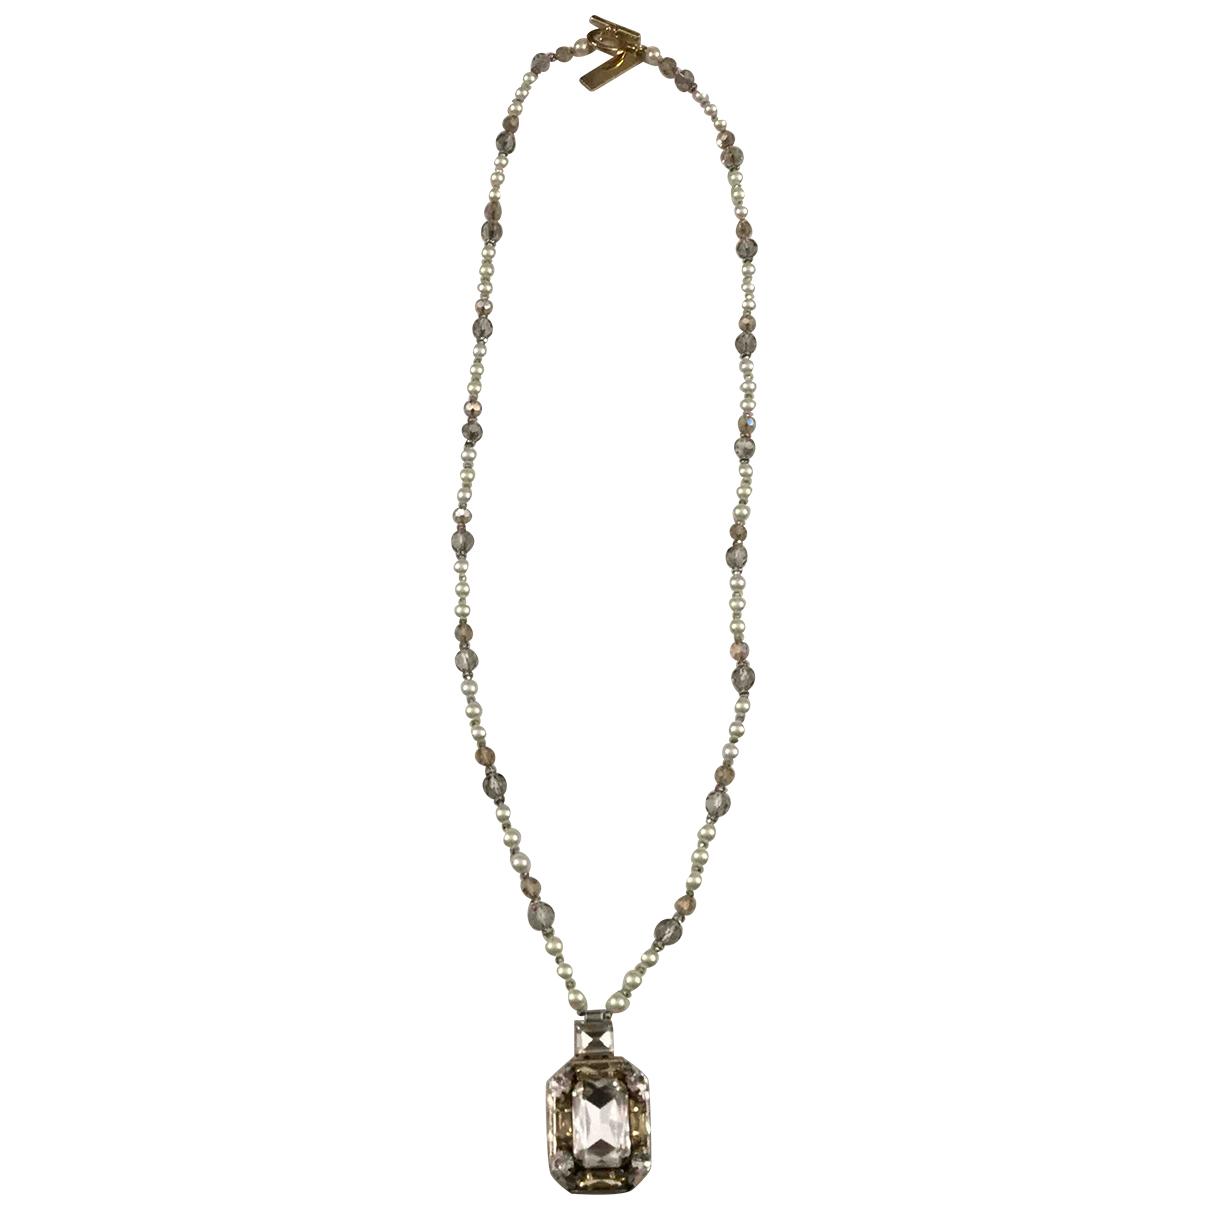 Max Mara N White Metal Long necklace for Women N